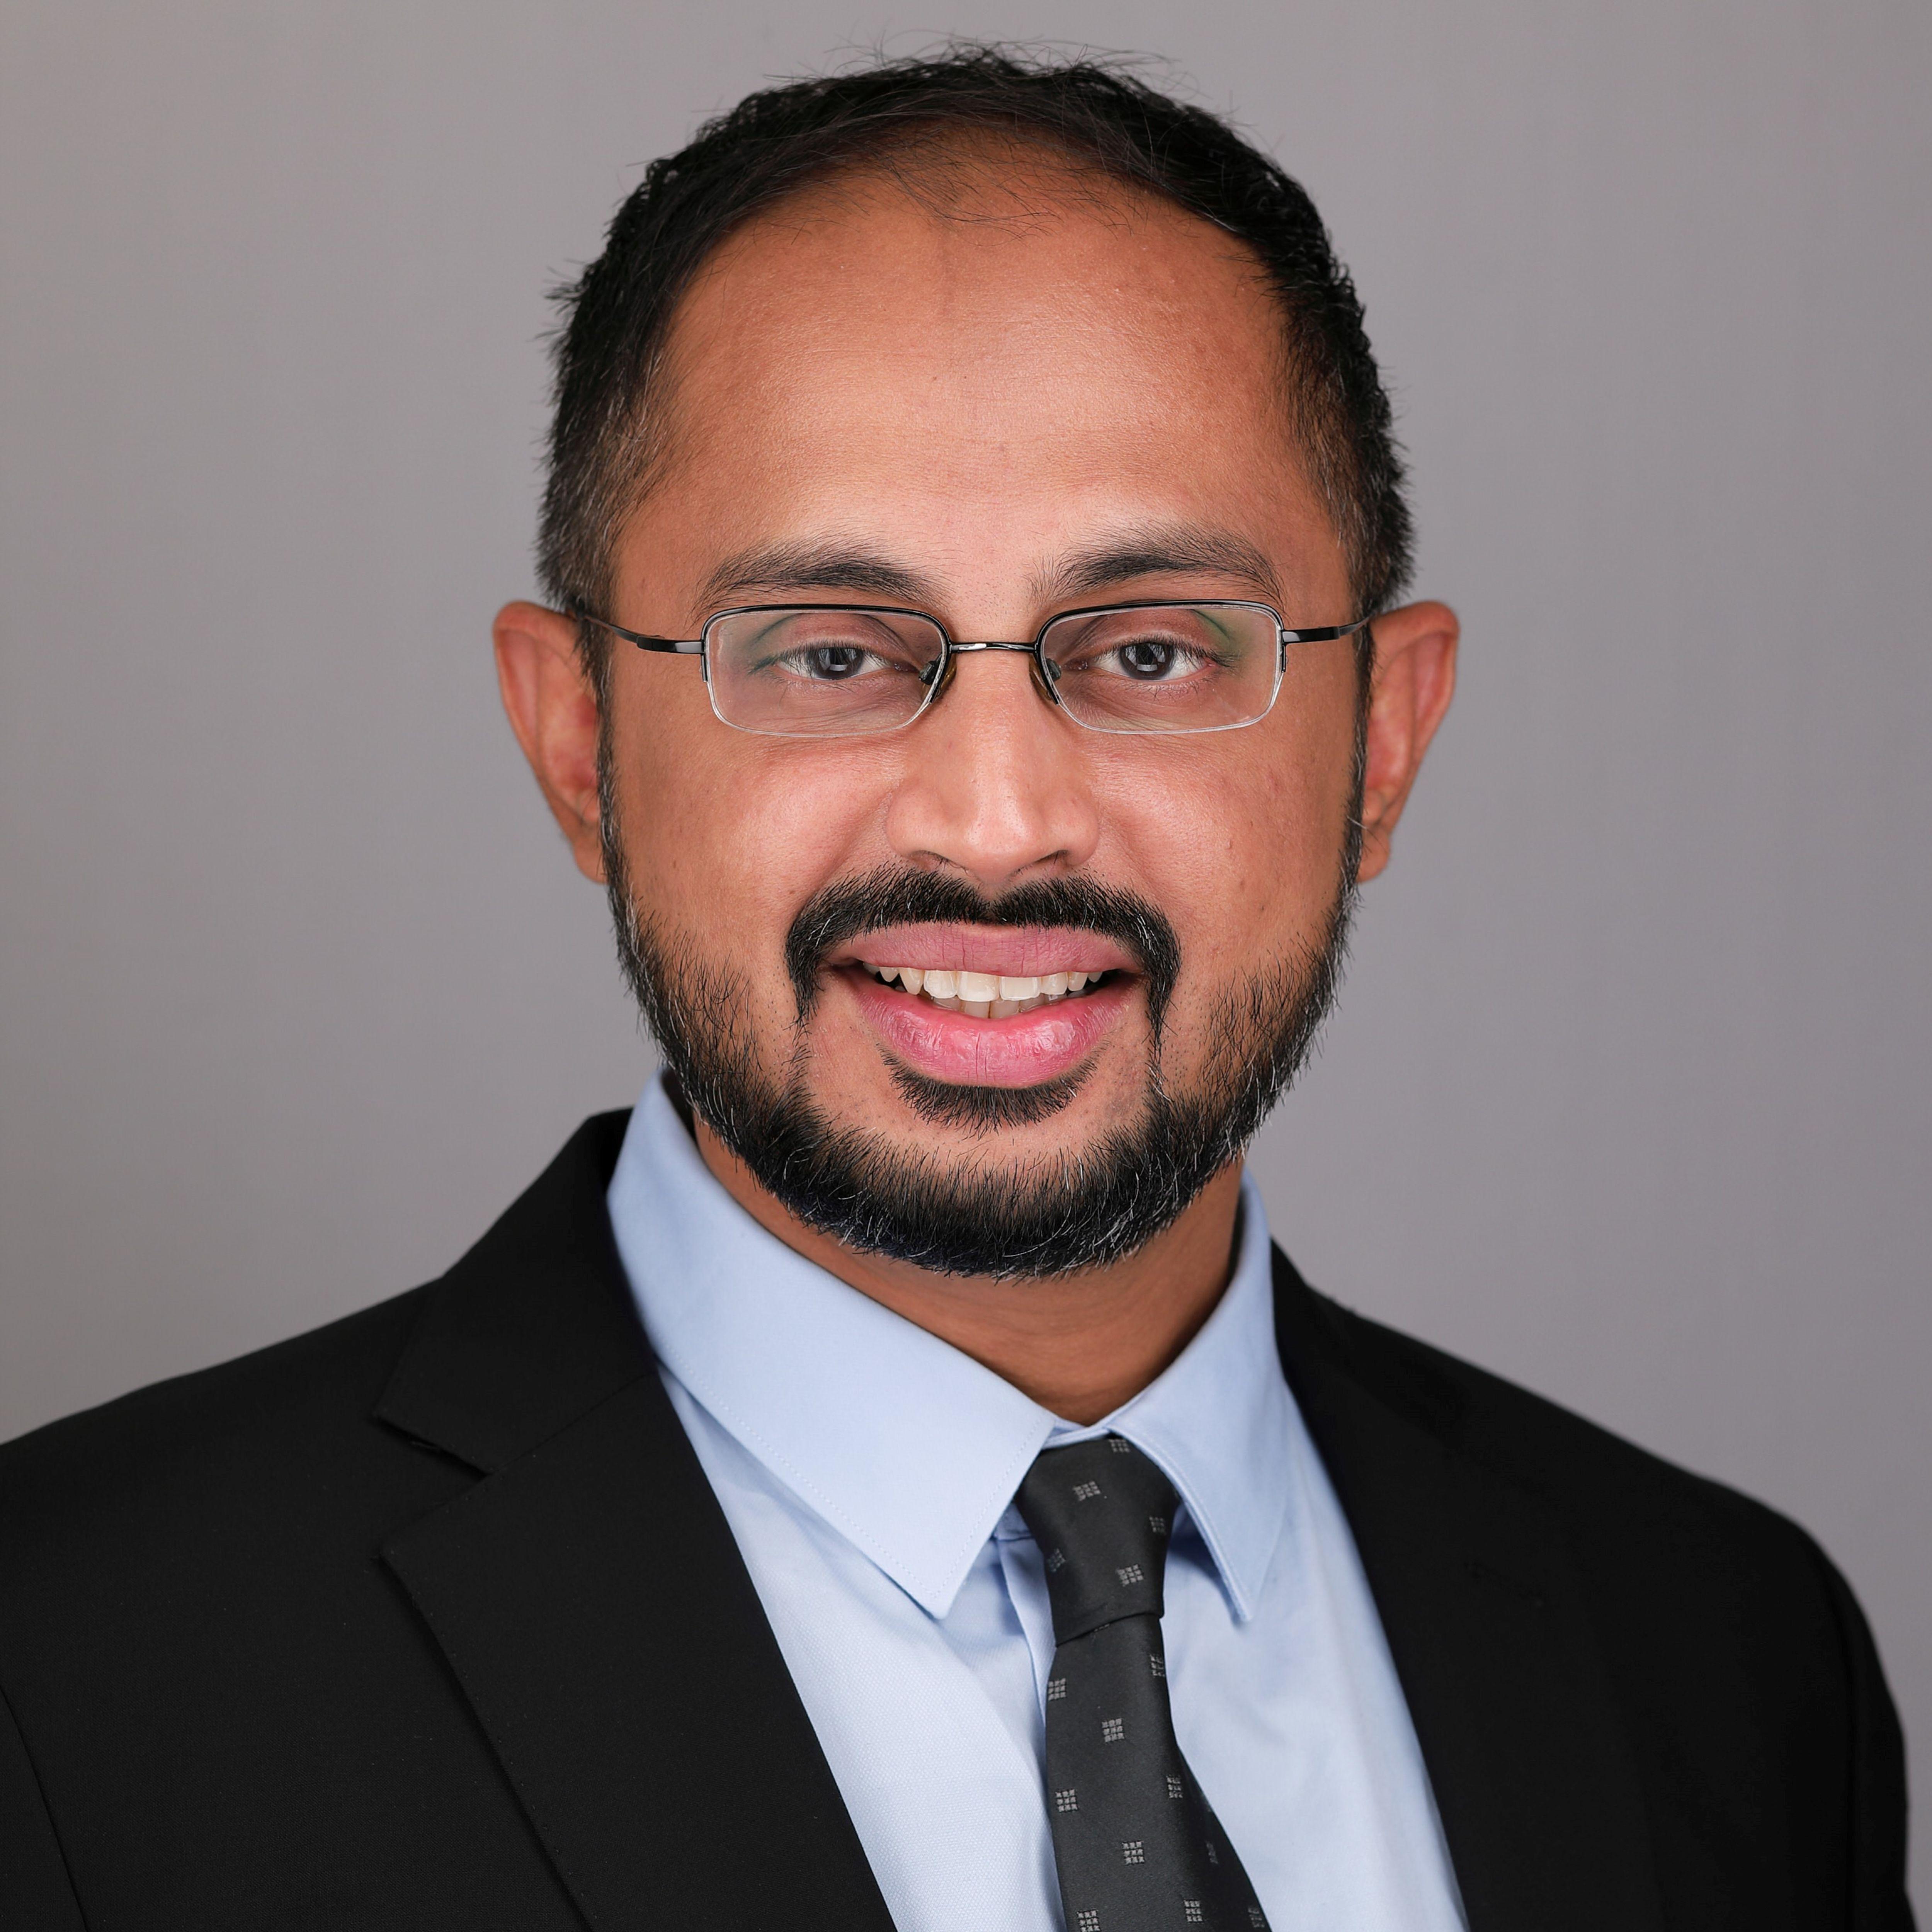 Abhi Rajendran